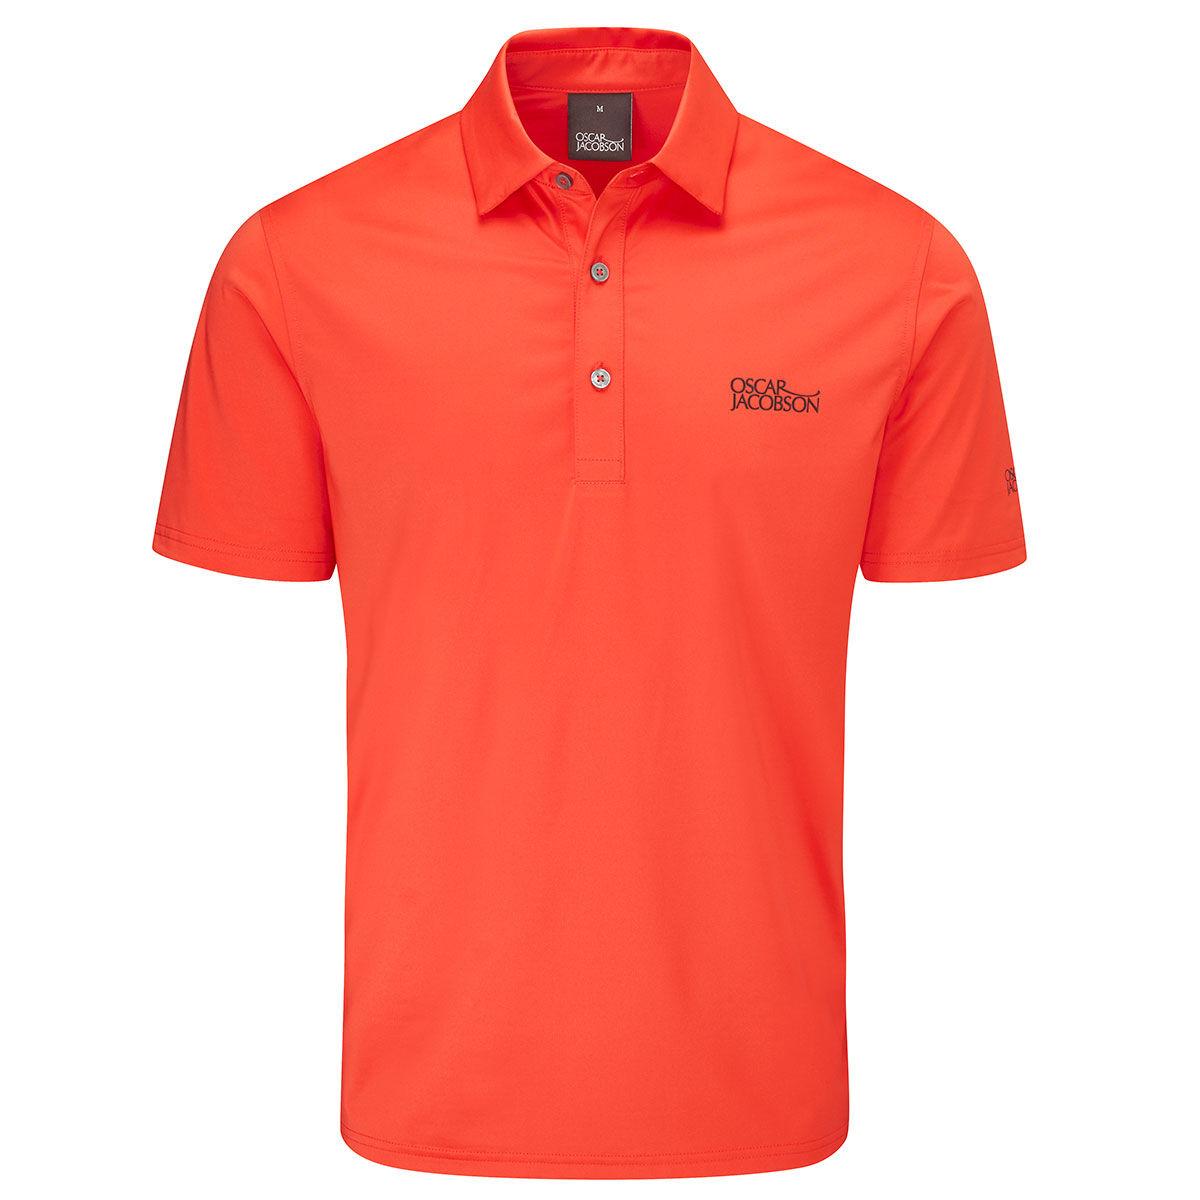 Oscar Jacobson Chap Tour Golf Polo Shirt, Mens, Fiesta, Large | American Golf